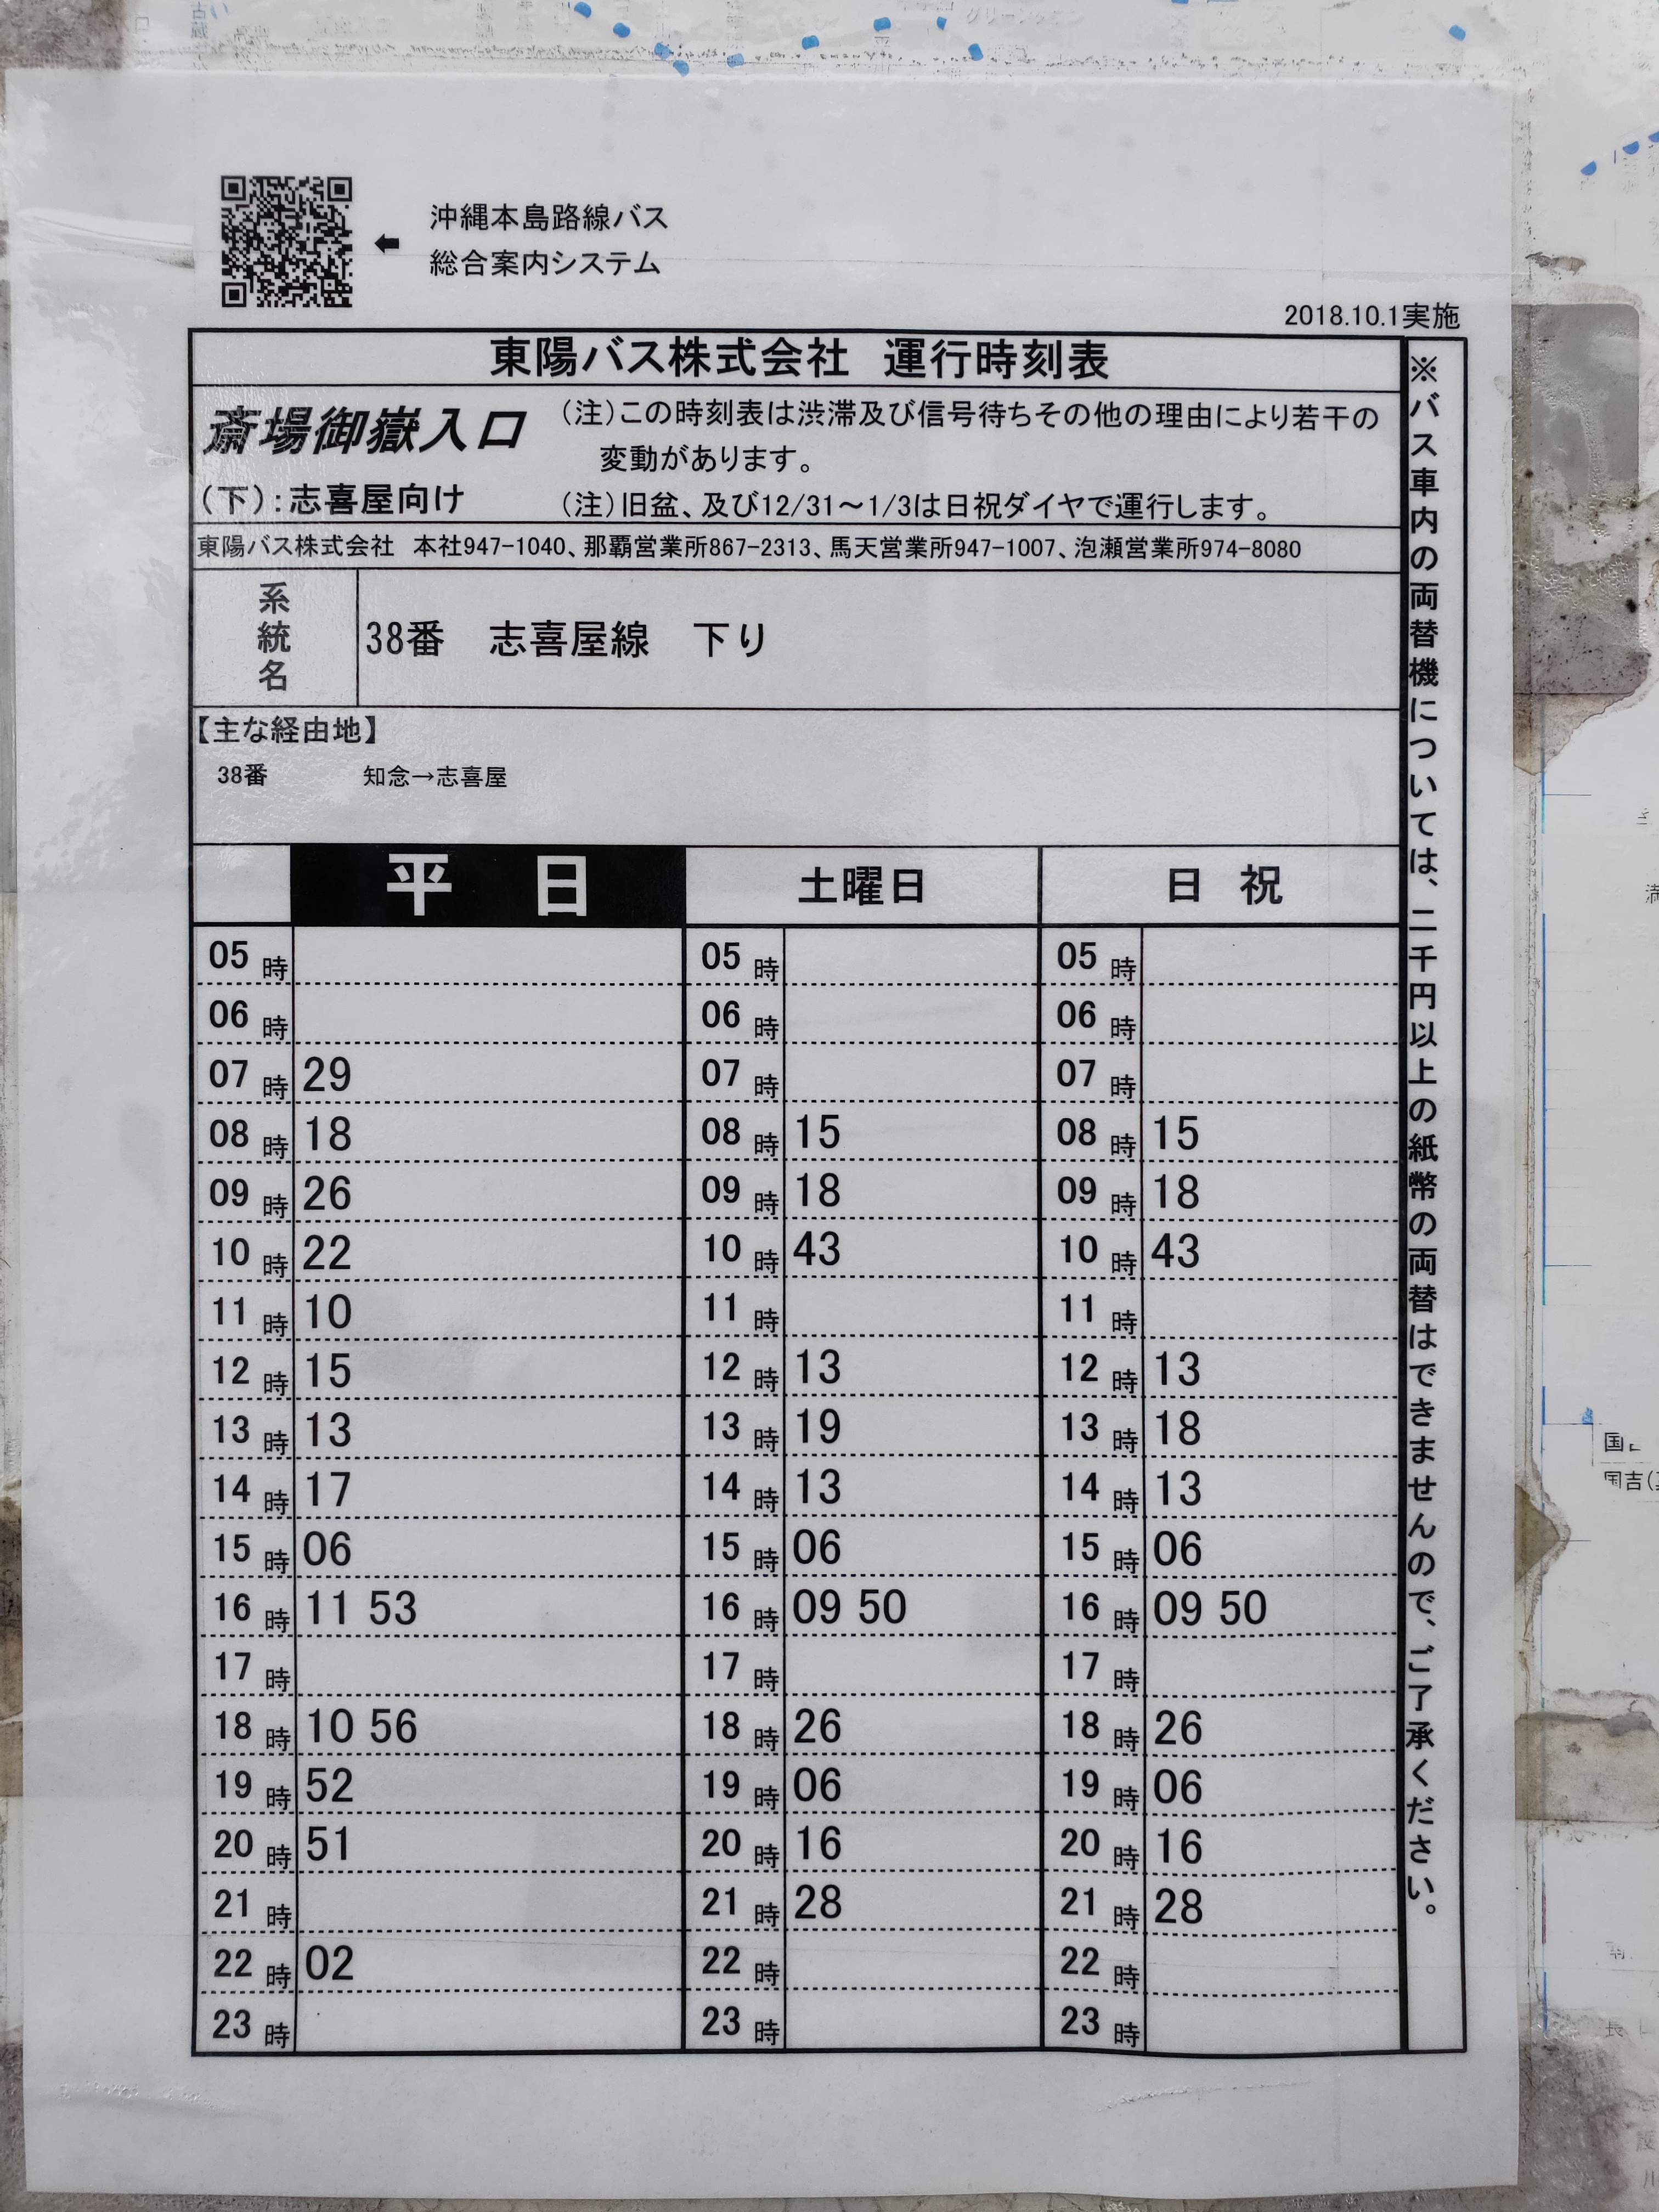 斎場御嶽入り口 バス停 時刻表